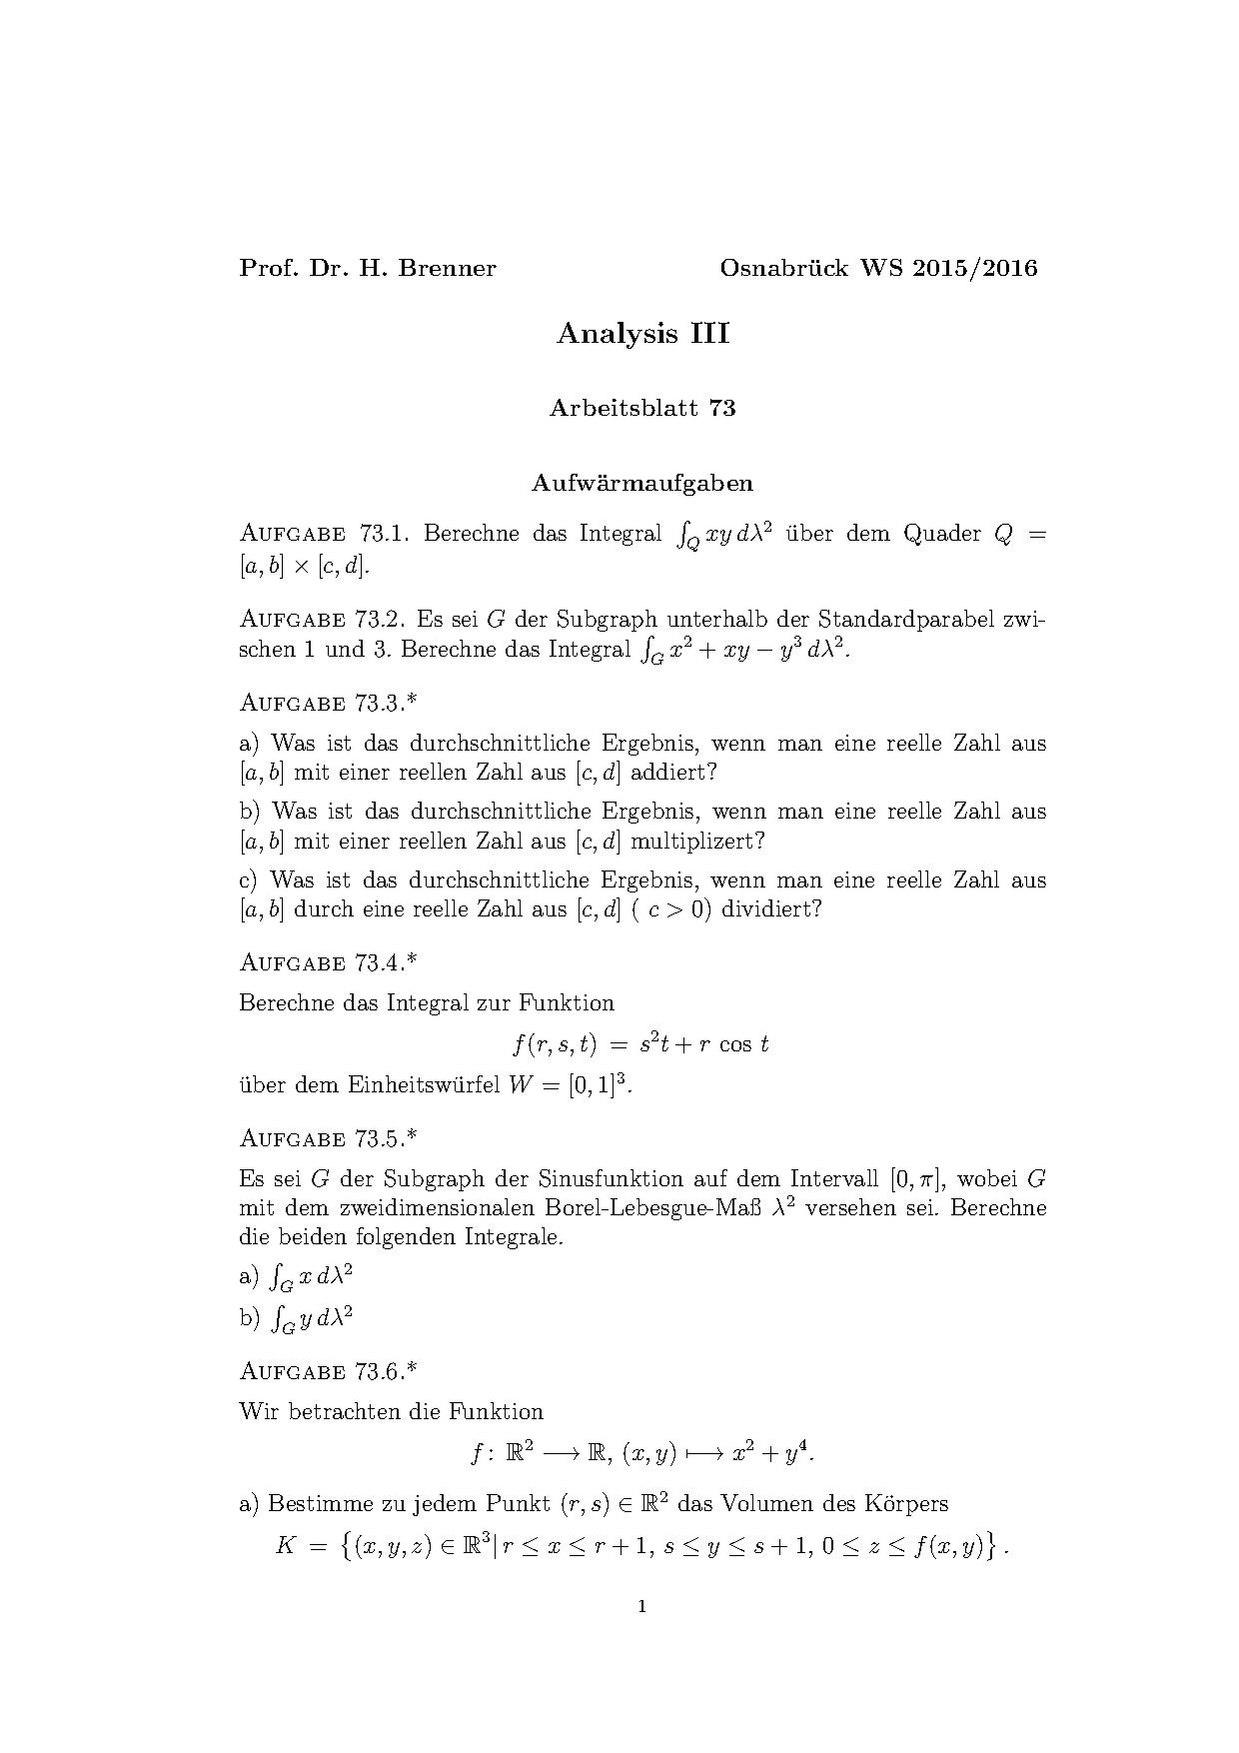 File:Analysis (Osnabrück 2014-2016)Teil IIIArbeitsblatt73.pdf ...